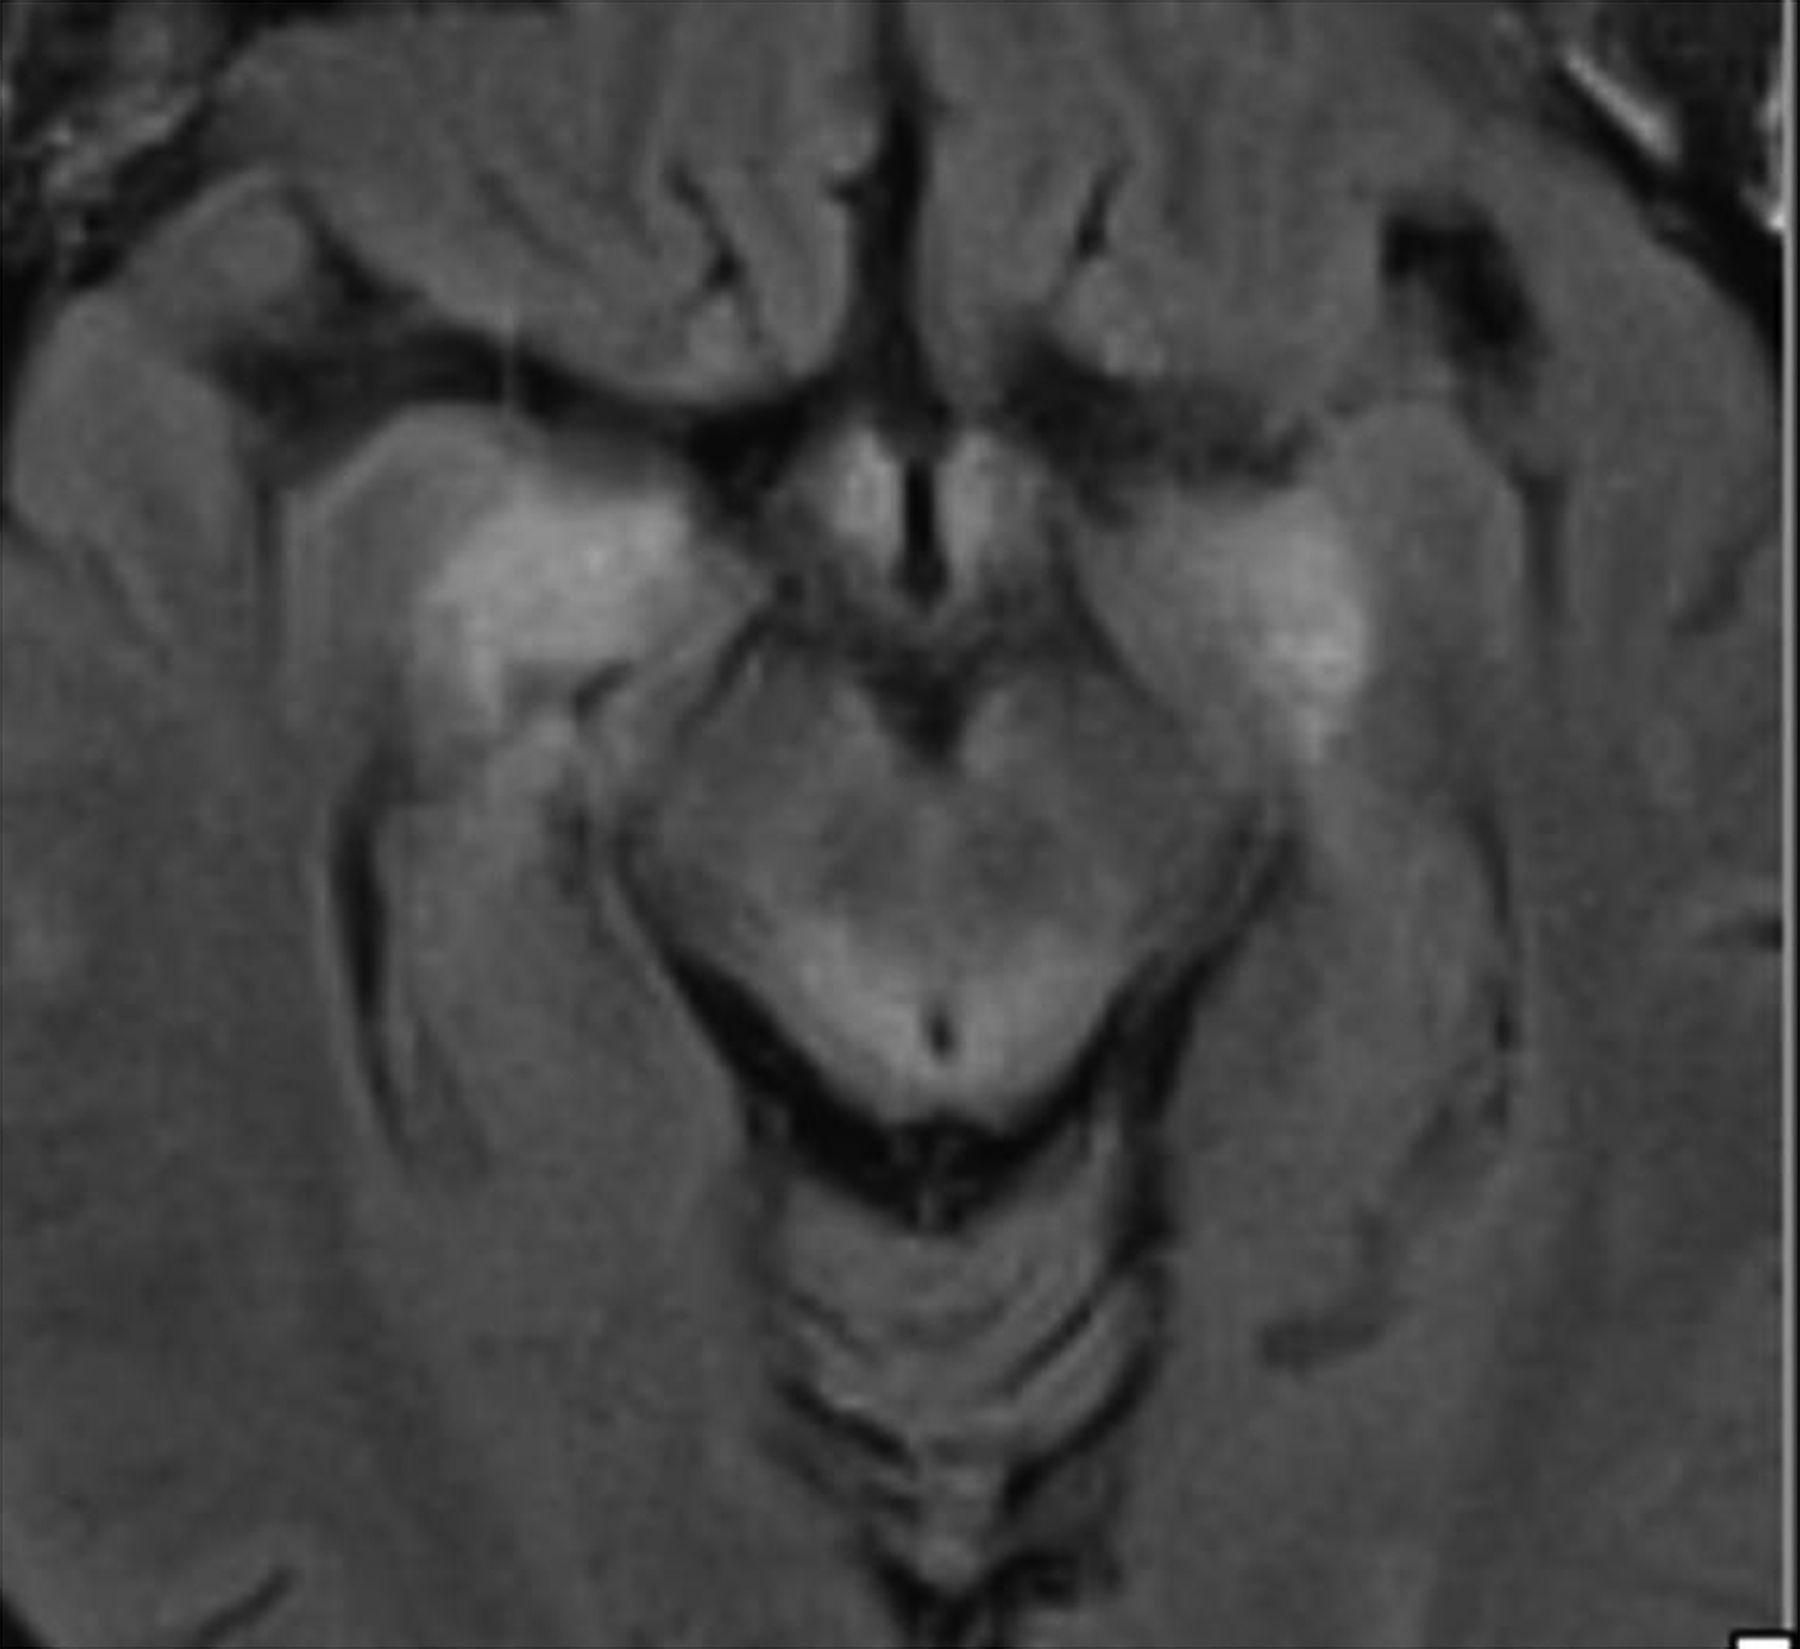 Midbrain encephalitis associated with neoplasia | Practical